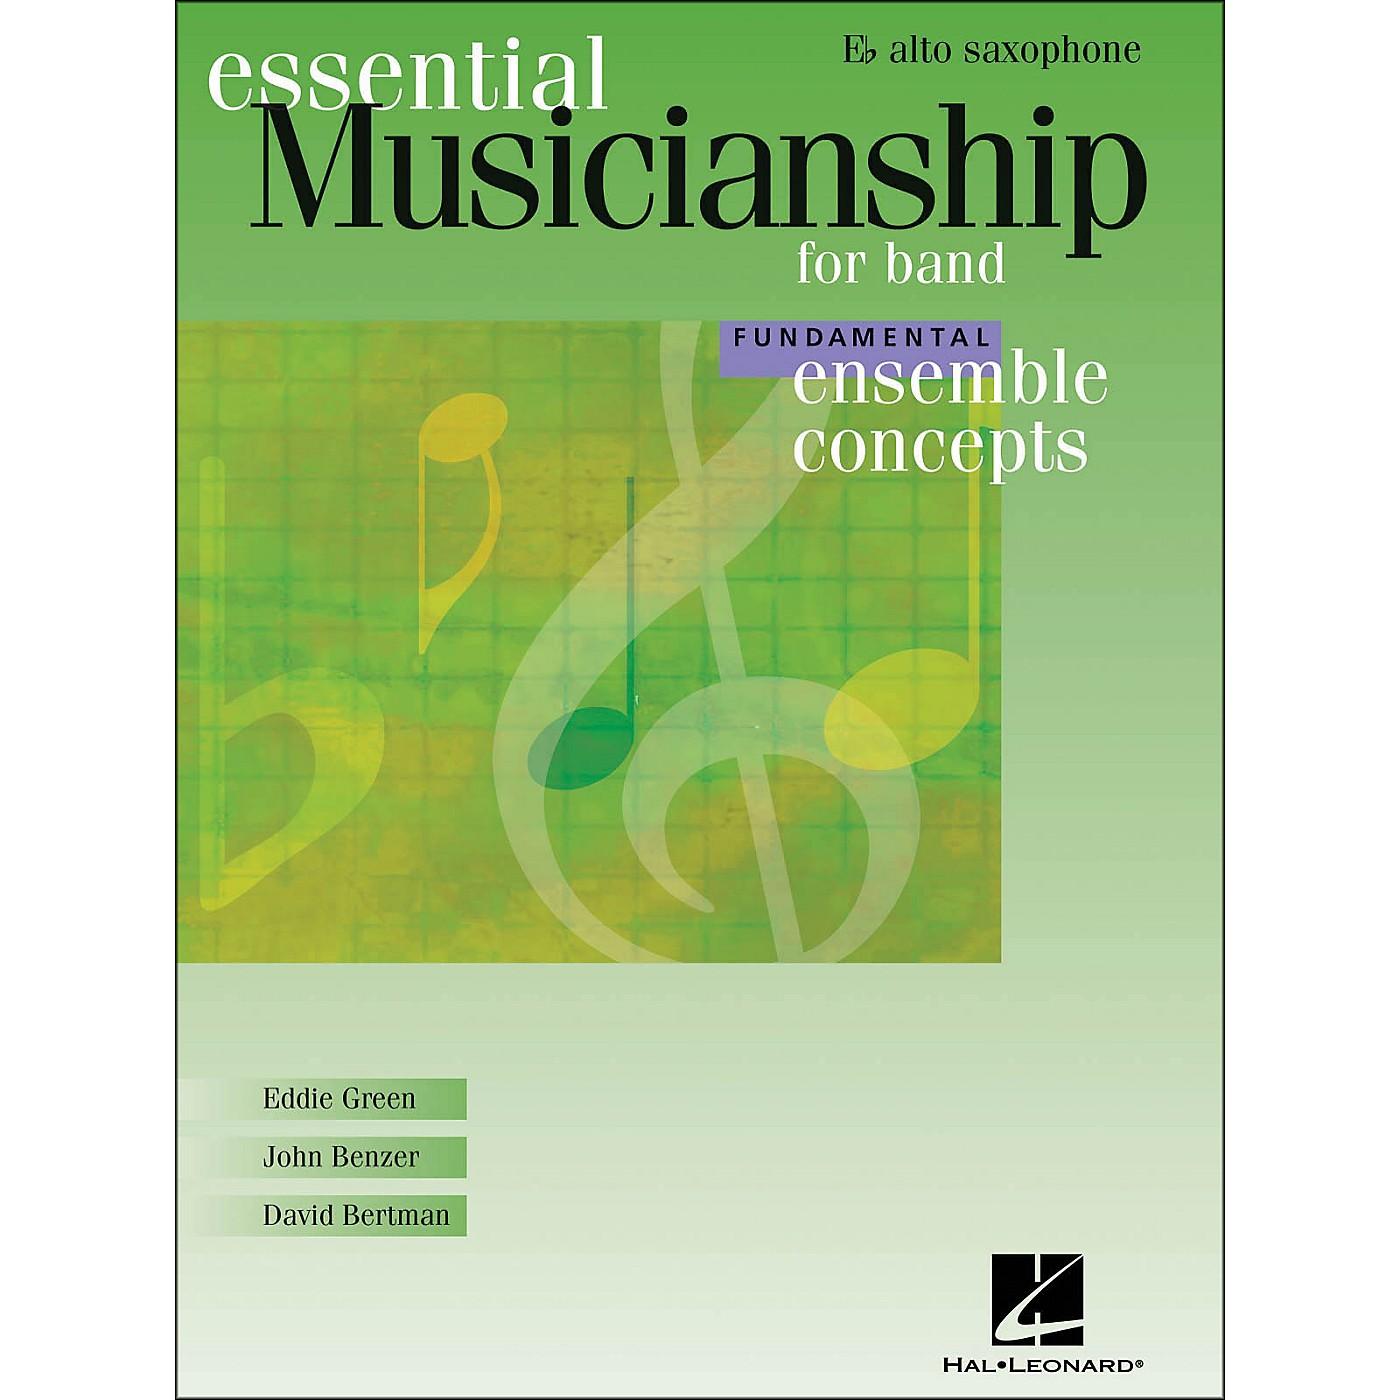 Hal Leonard Ensemble Concepts for Band - Fundamental Level Alto Sax thumbnail